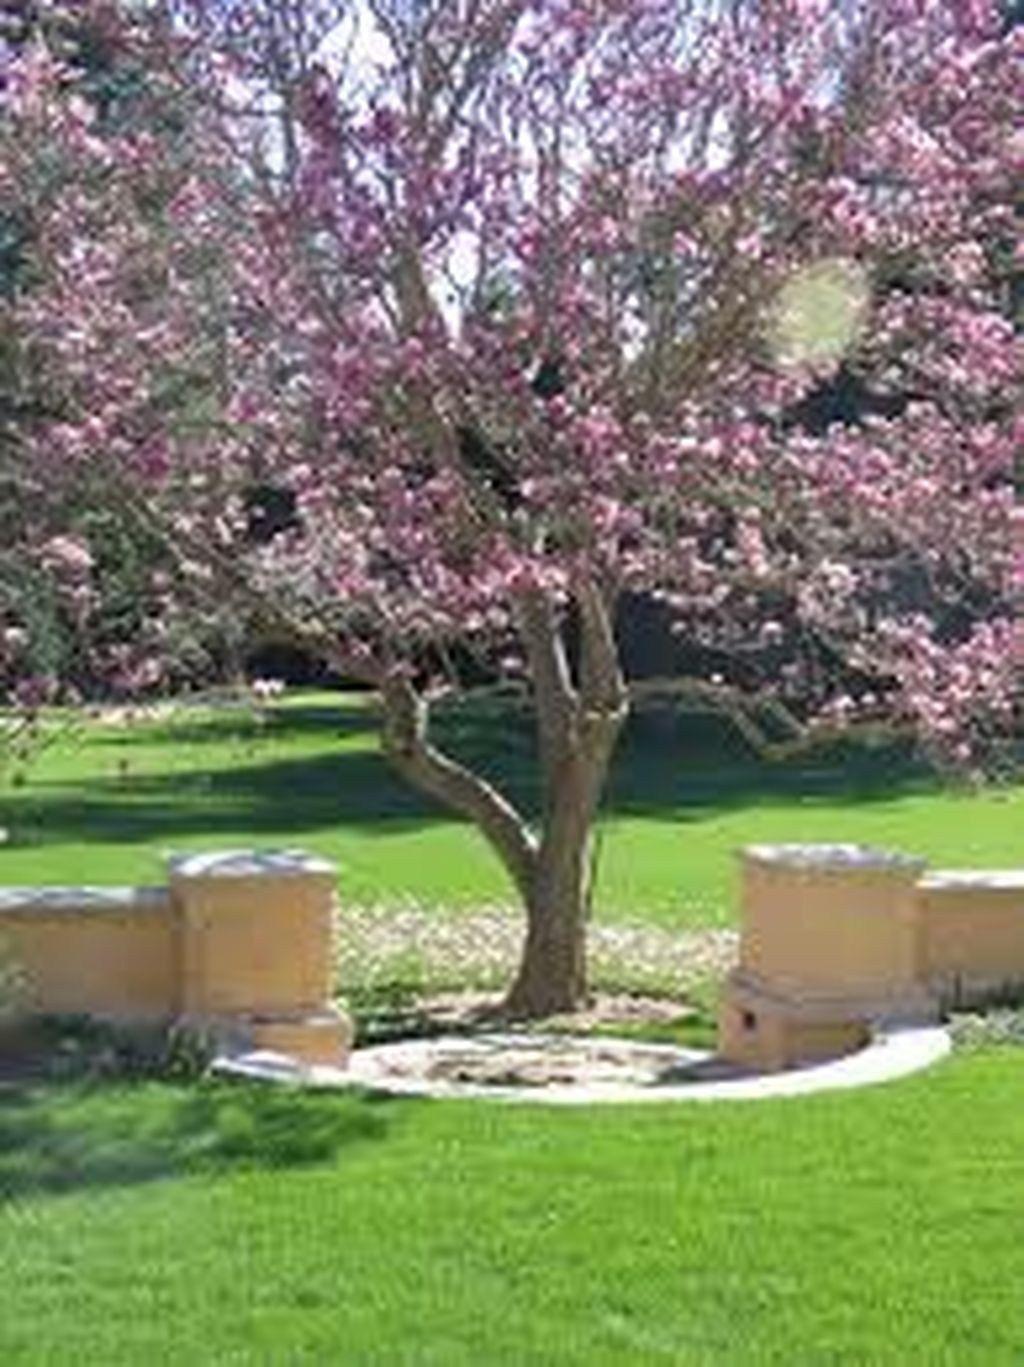 Amazing Big Tree Landscaping Ideas01 Front Yard Landscaping Landscape Design Front Yard Landscaping Design